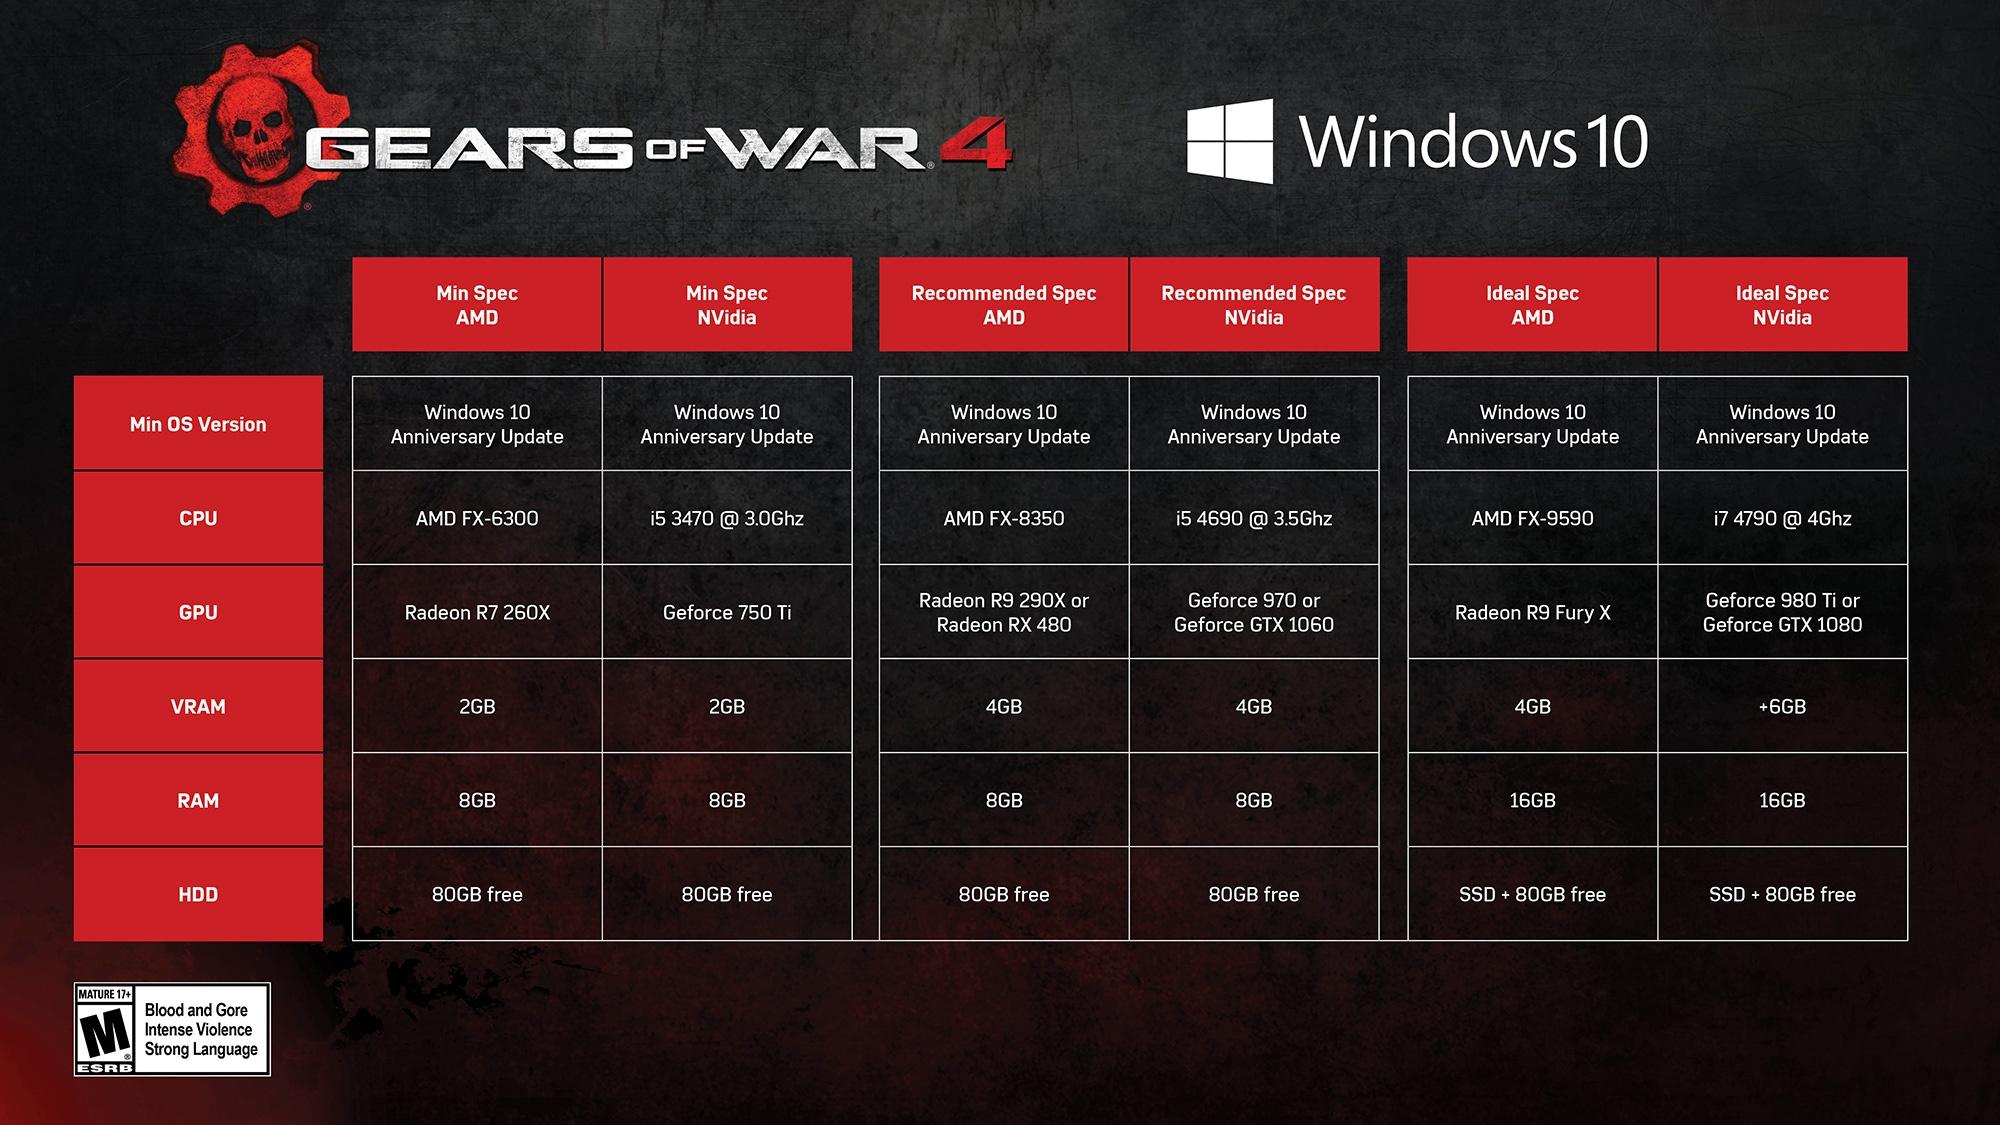 gears_of_war_4_etc._screenshot_201608161